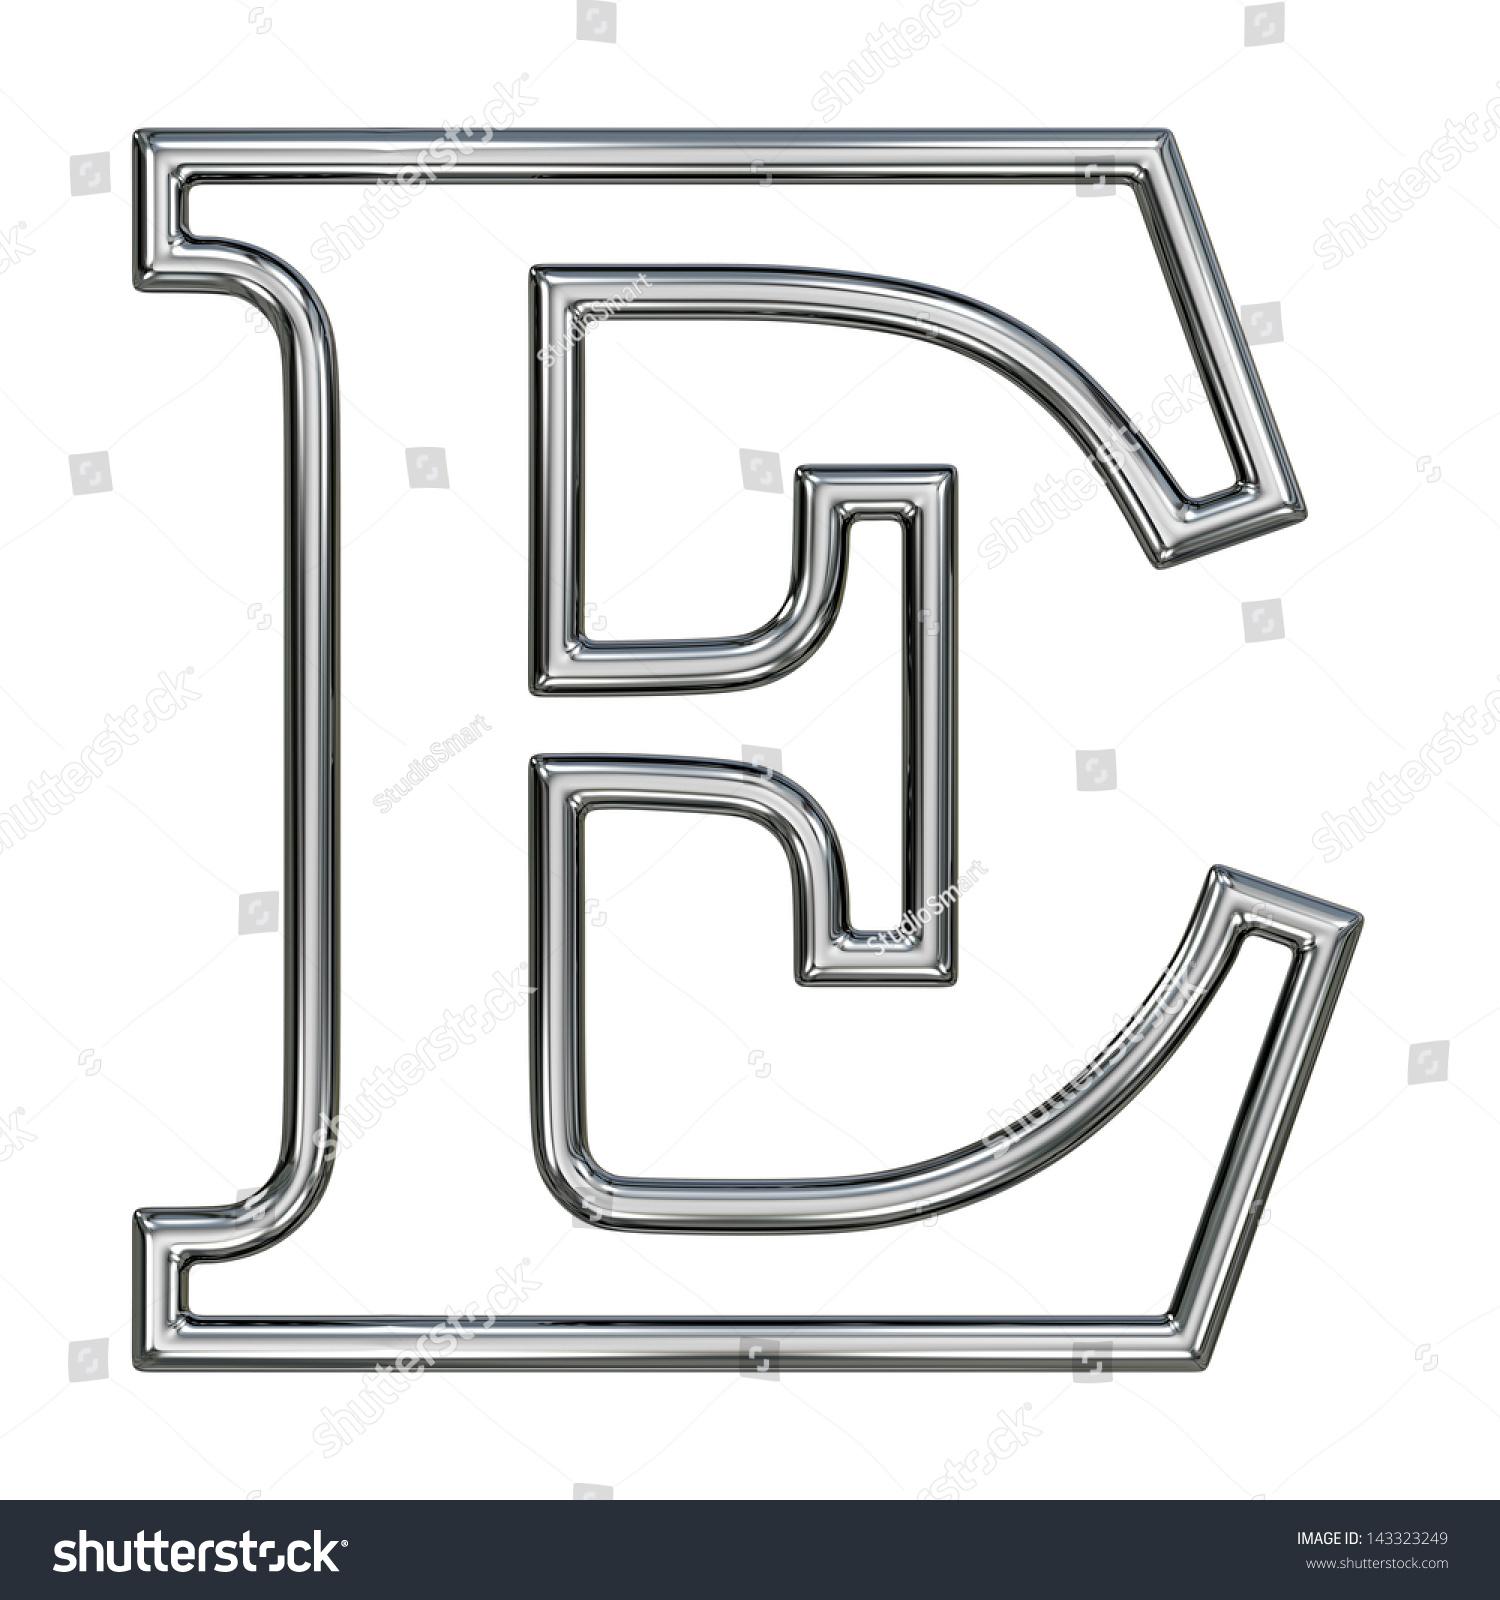 Royalty Free Stock Illustration of Alphabet Symbol E Chrome Pipe